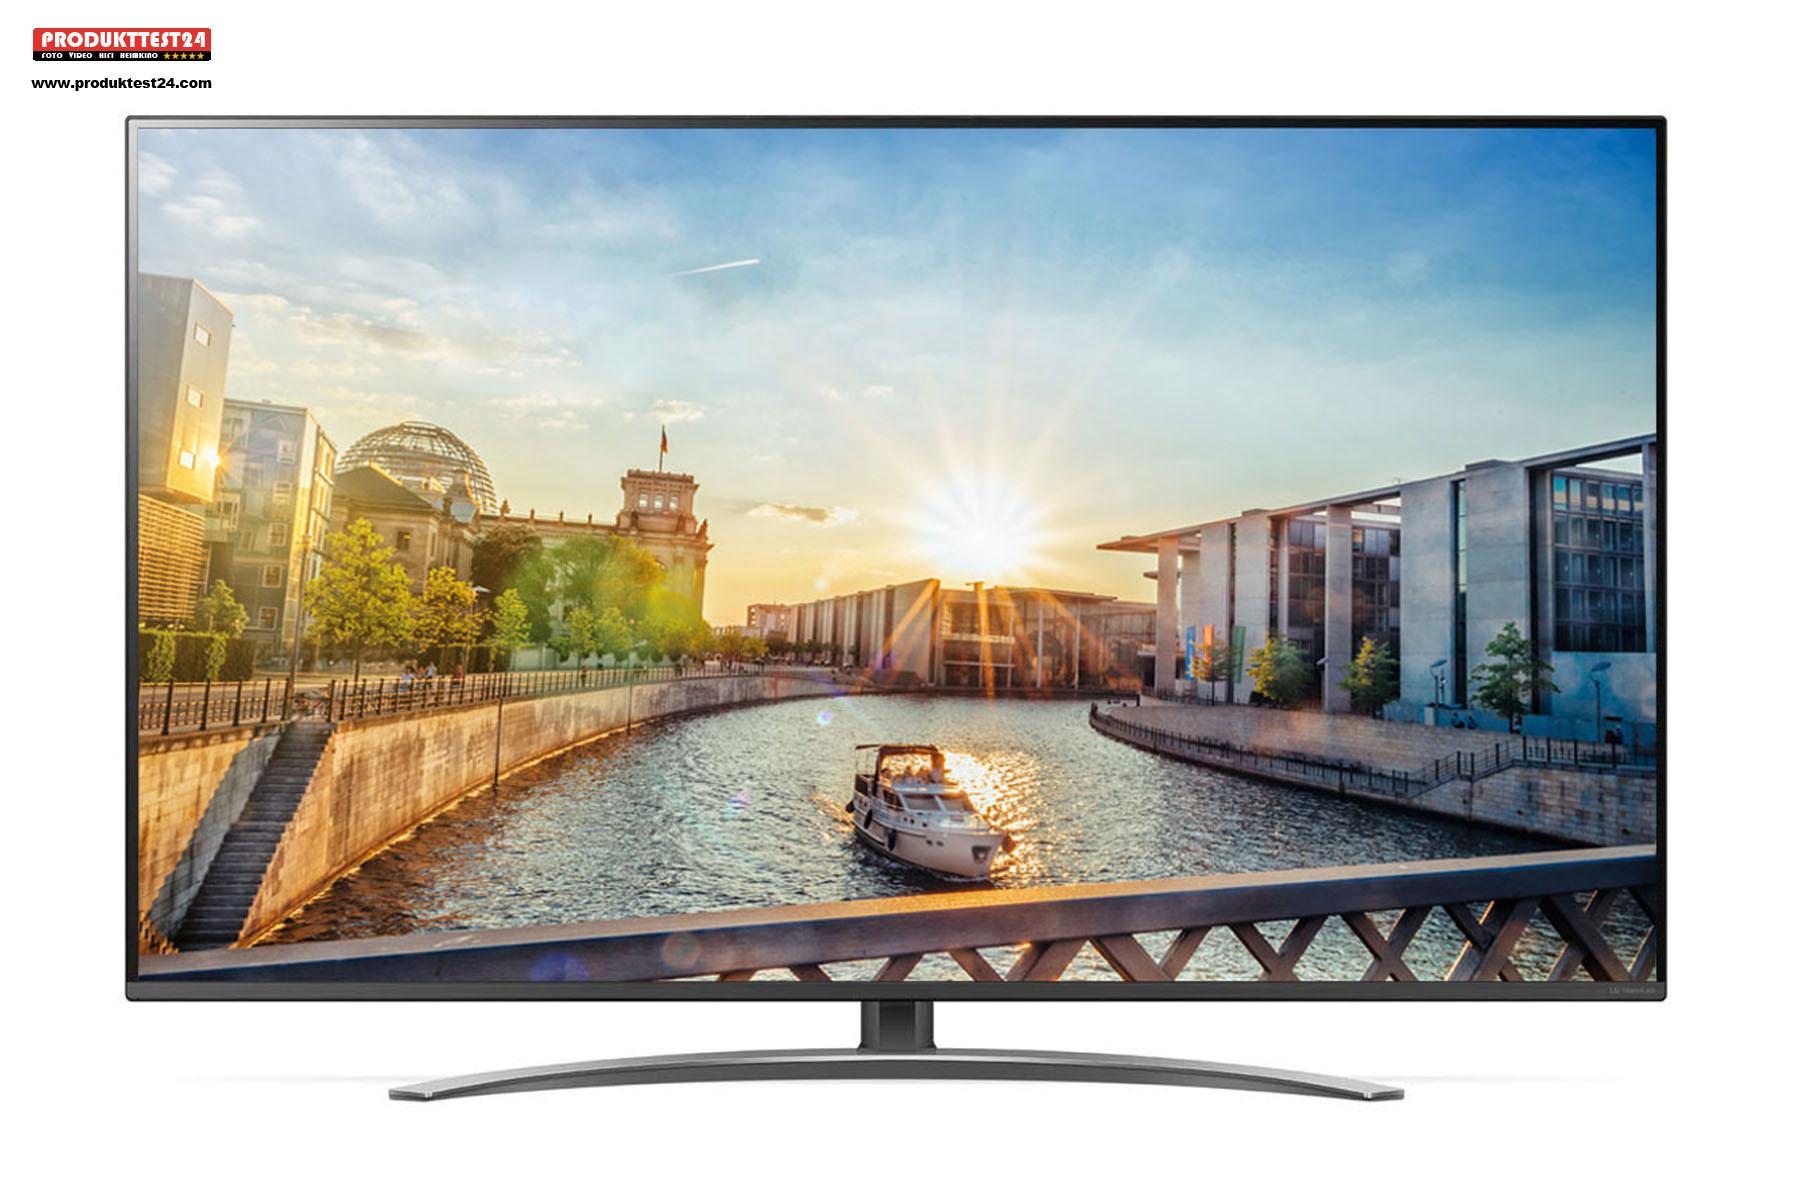 Der 65 Zoll LG 65SM82007LA NanoCell 4K TV